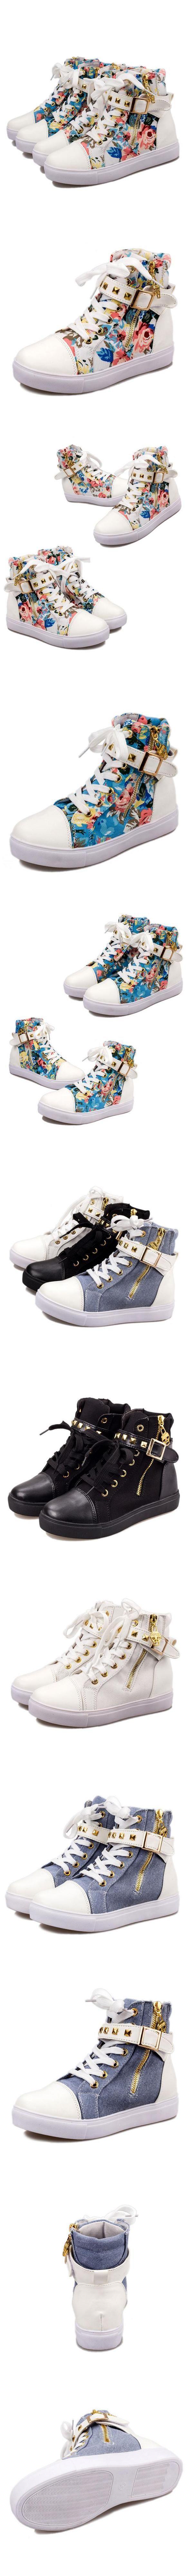 2017 Autumn New High Help Canvas Shoes, Women Shoes, Tide Zipper, Rivets, Students Flat White , https://myalphastore.com/products/2017-autumn-new-high-help-canvas-shoes-women-shoes-tide-zipper-rivets-students-flat-white/,